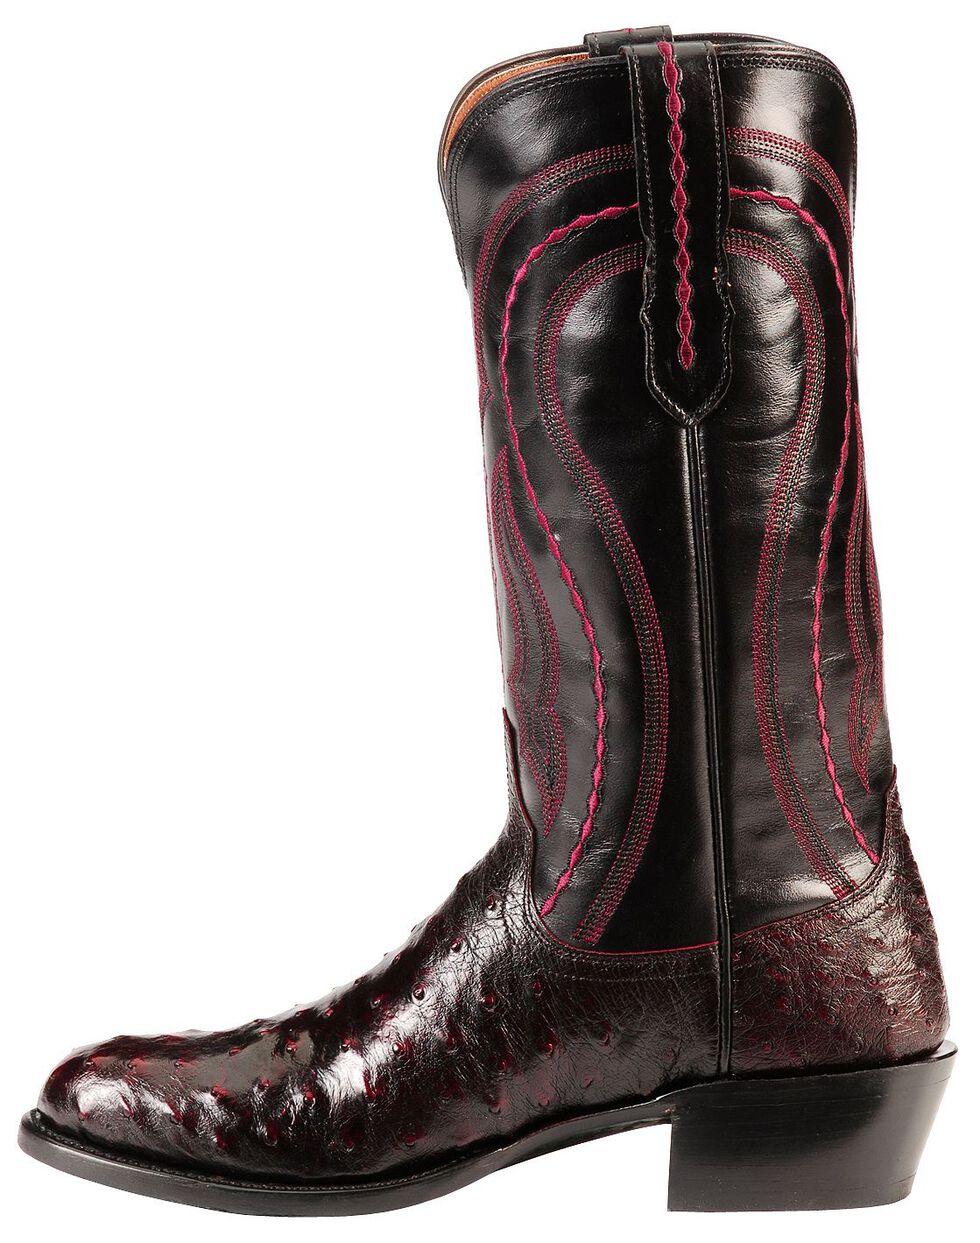 Lucchese Handmade 1883 Full Quill Ostrich Montana Cowboy Boots - Medium Toe, Black Cherry, hi-res